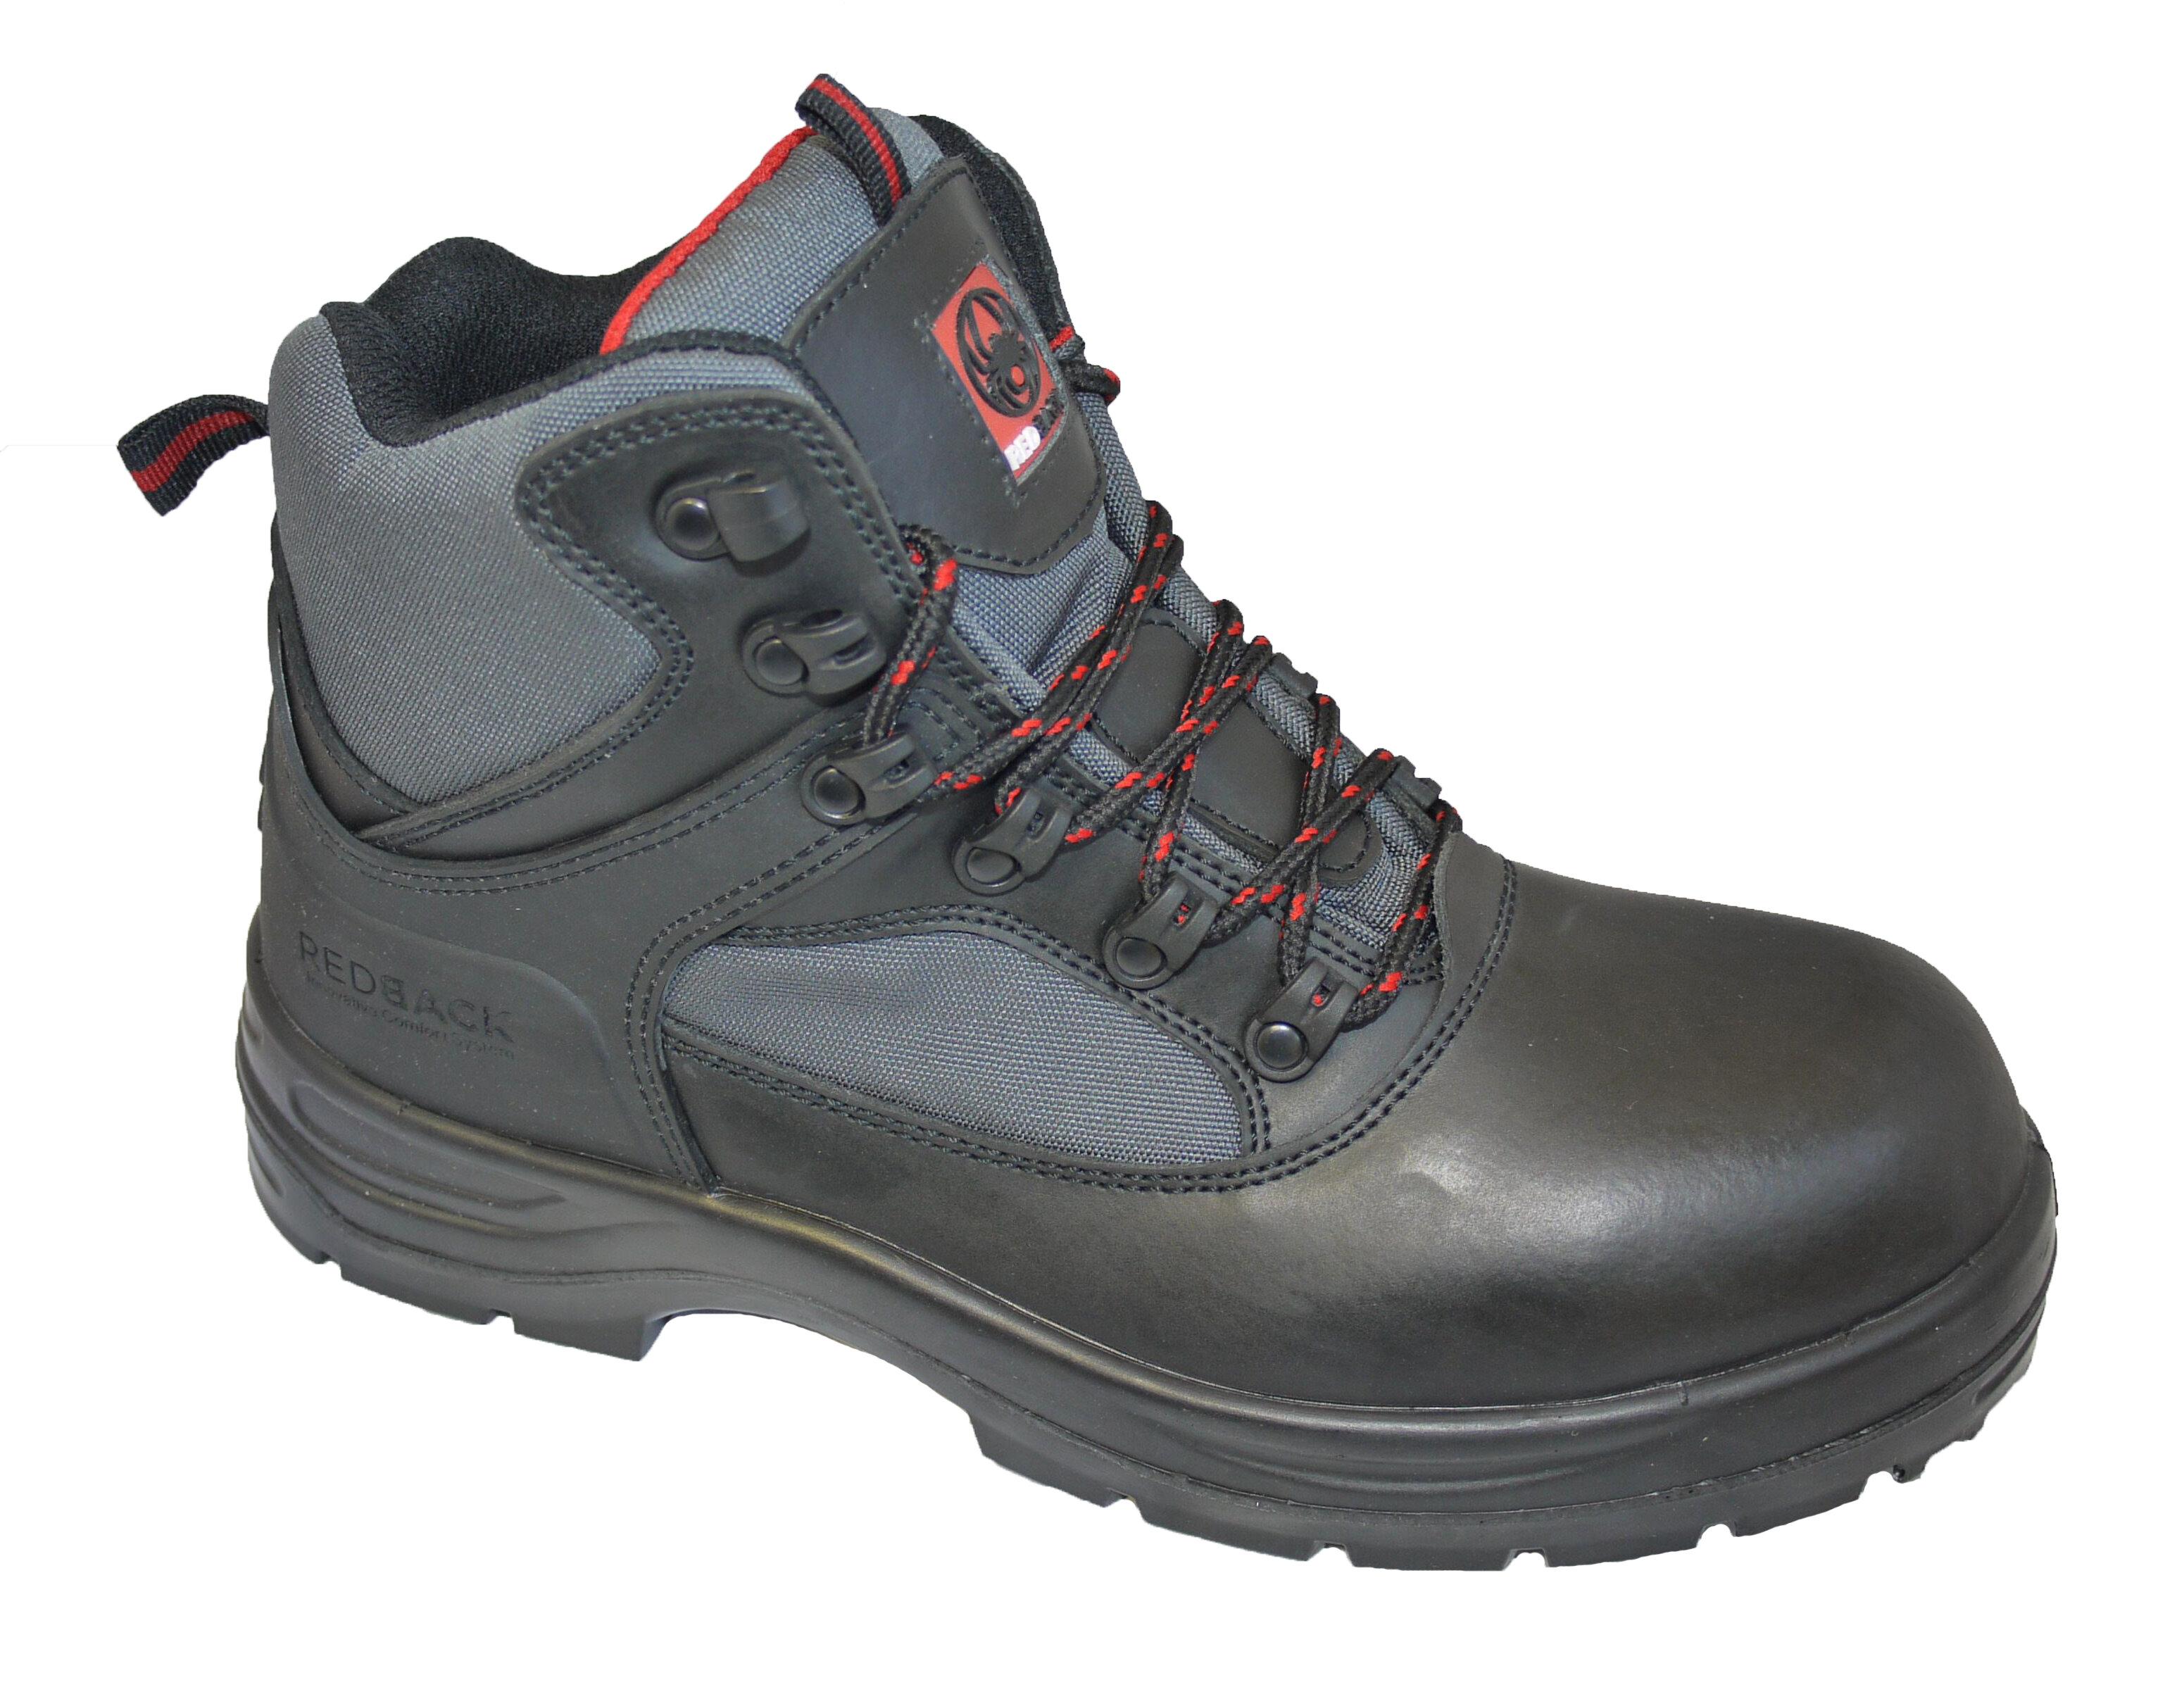 REDBACK Pioneer Black Boot S3 CI SRC (Composite Toecap)